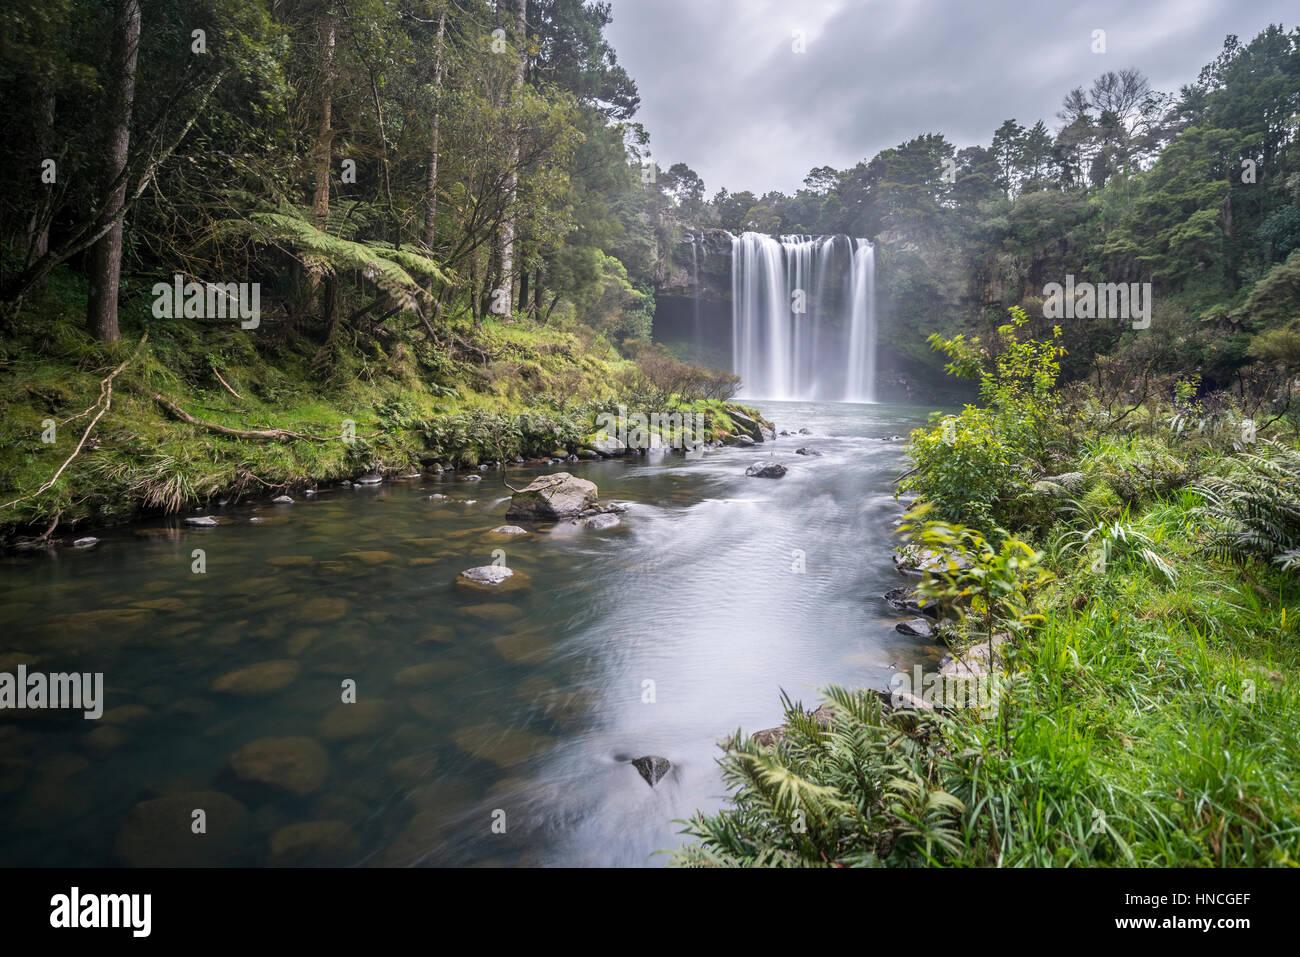 Waterfall, Rainbow Falls or Waianiwaniwa, Kerikeri River, Northland, North Island, New Zealand - Stock Image